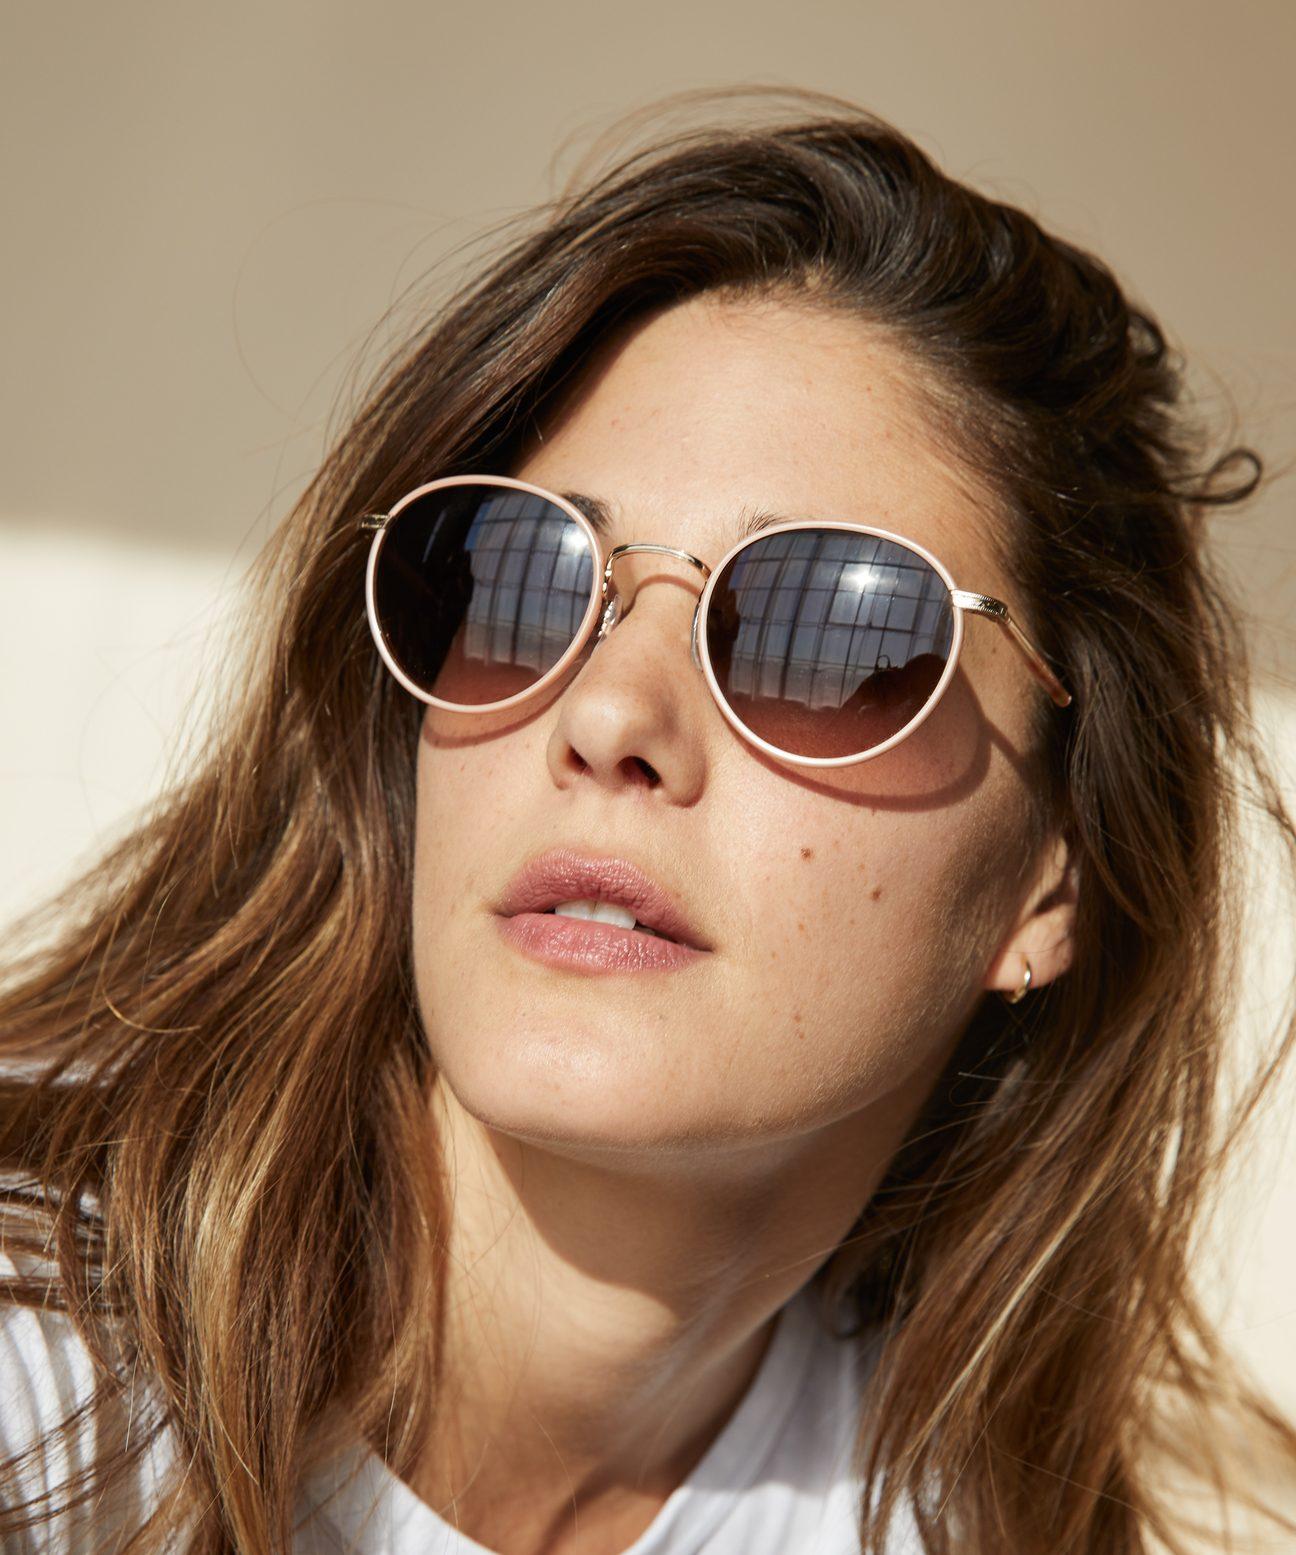 c757ea2bbe9a Wilson Sunglasses - Peach Tort/Desert Smoke | Jenni Kayne